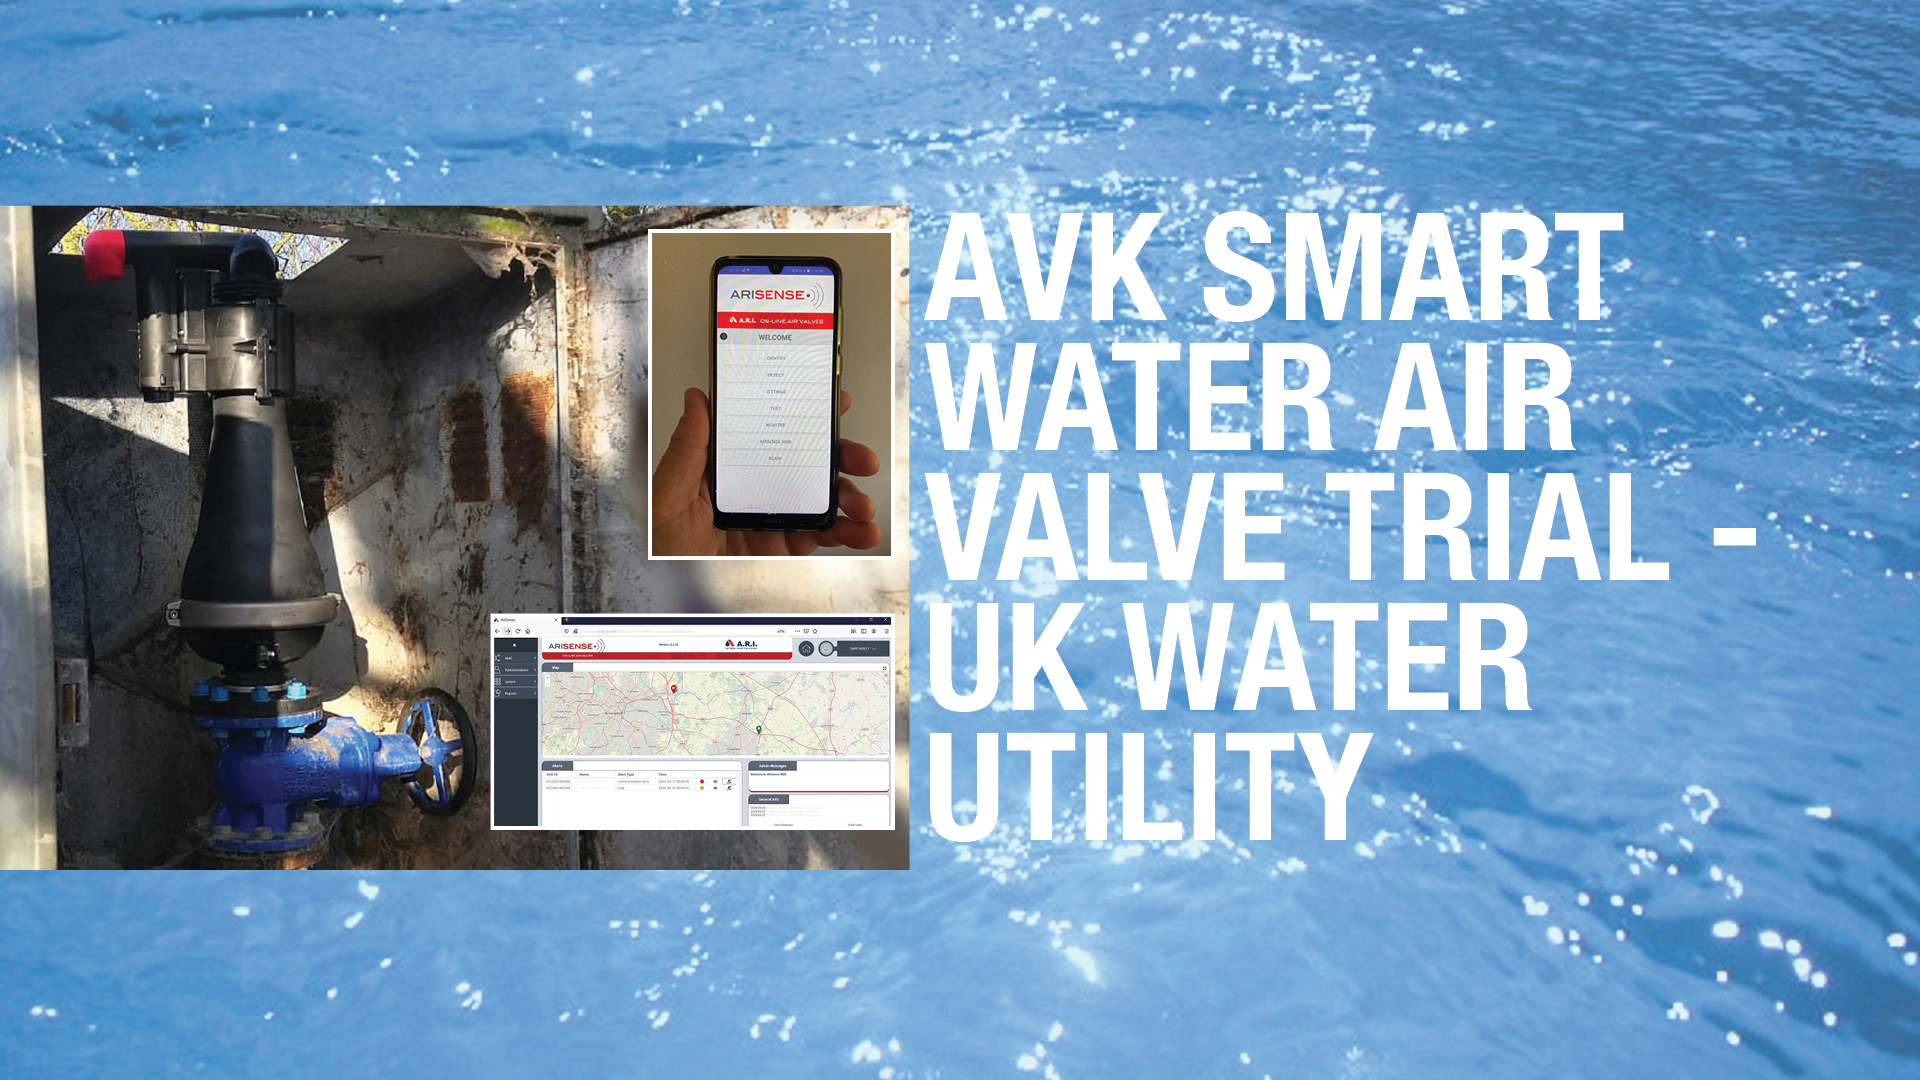 AVK UK Smart water  waste water air valve trial case-Top Banner